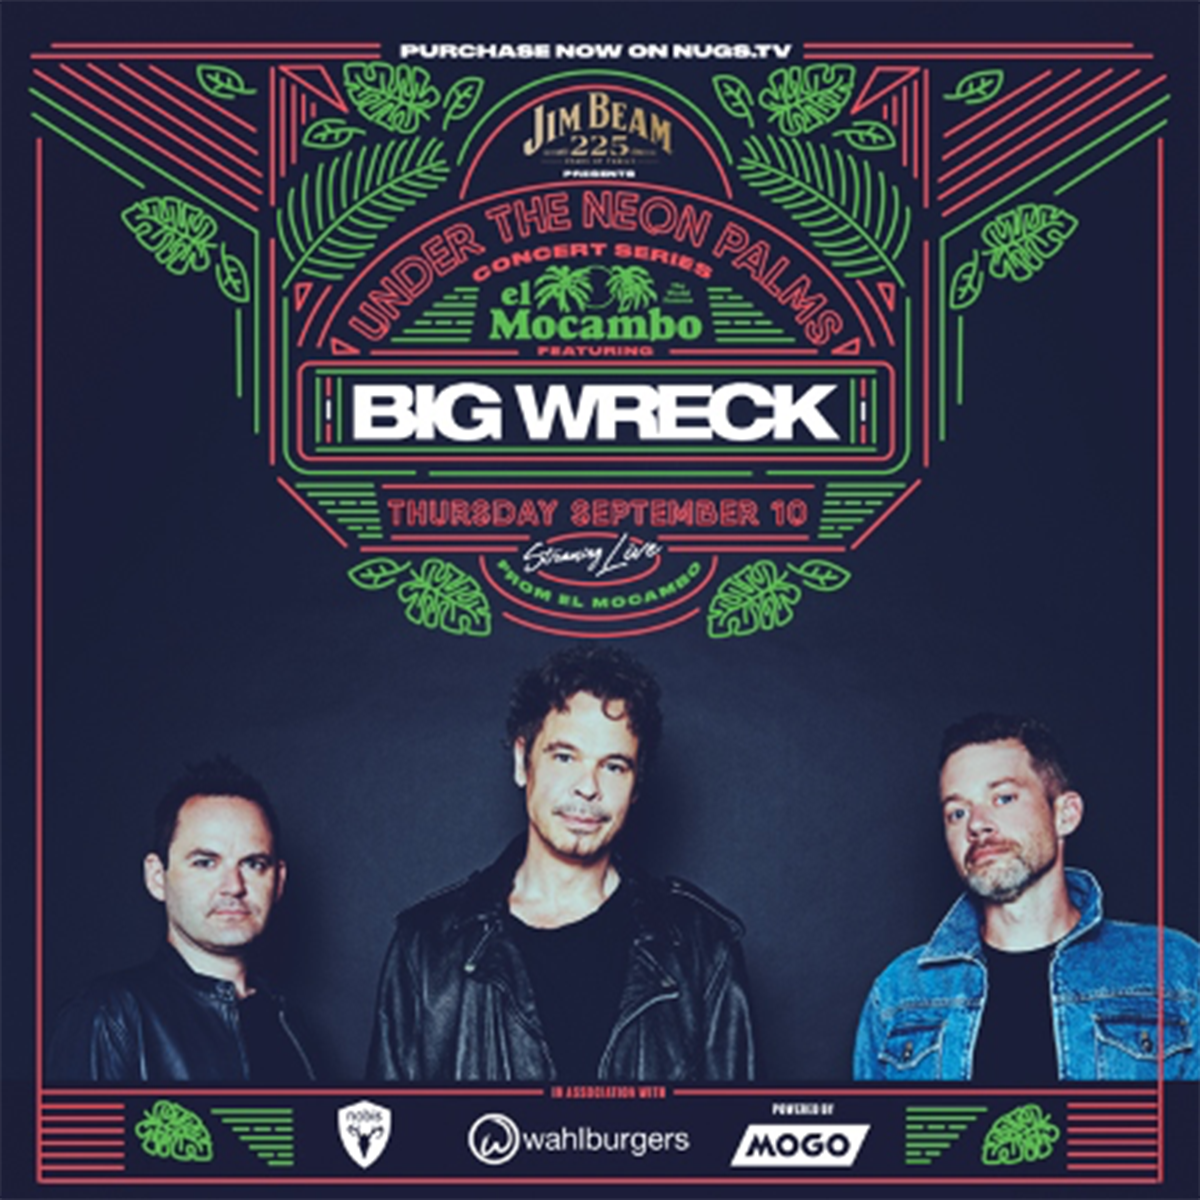 El Mocambo Finally Opens With Big Wreck Livestream Concert